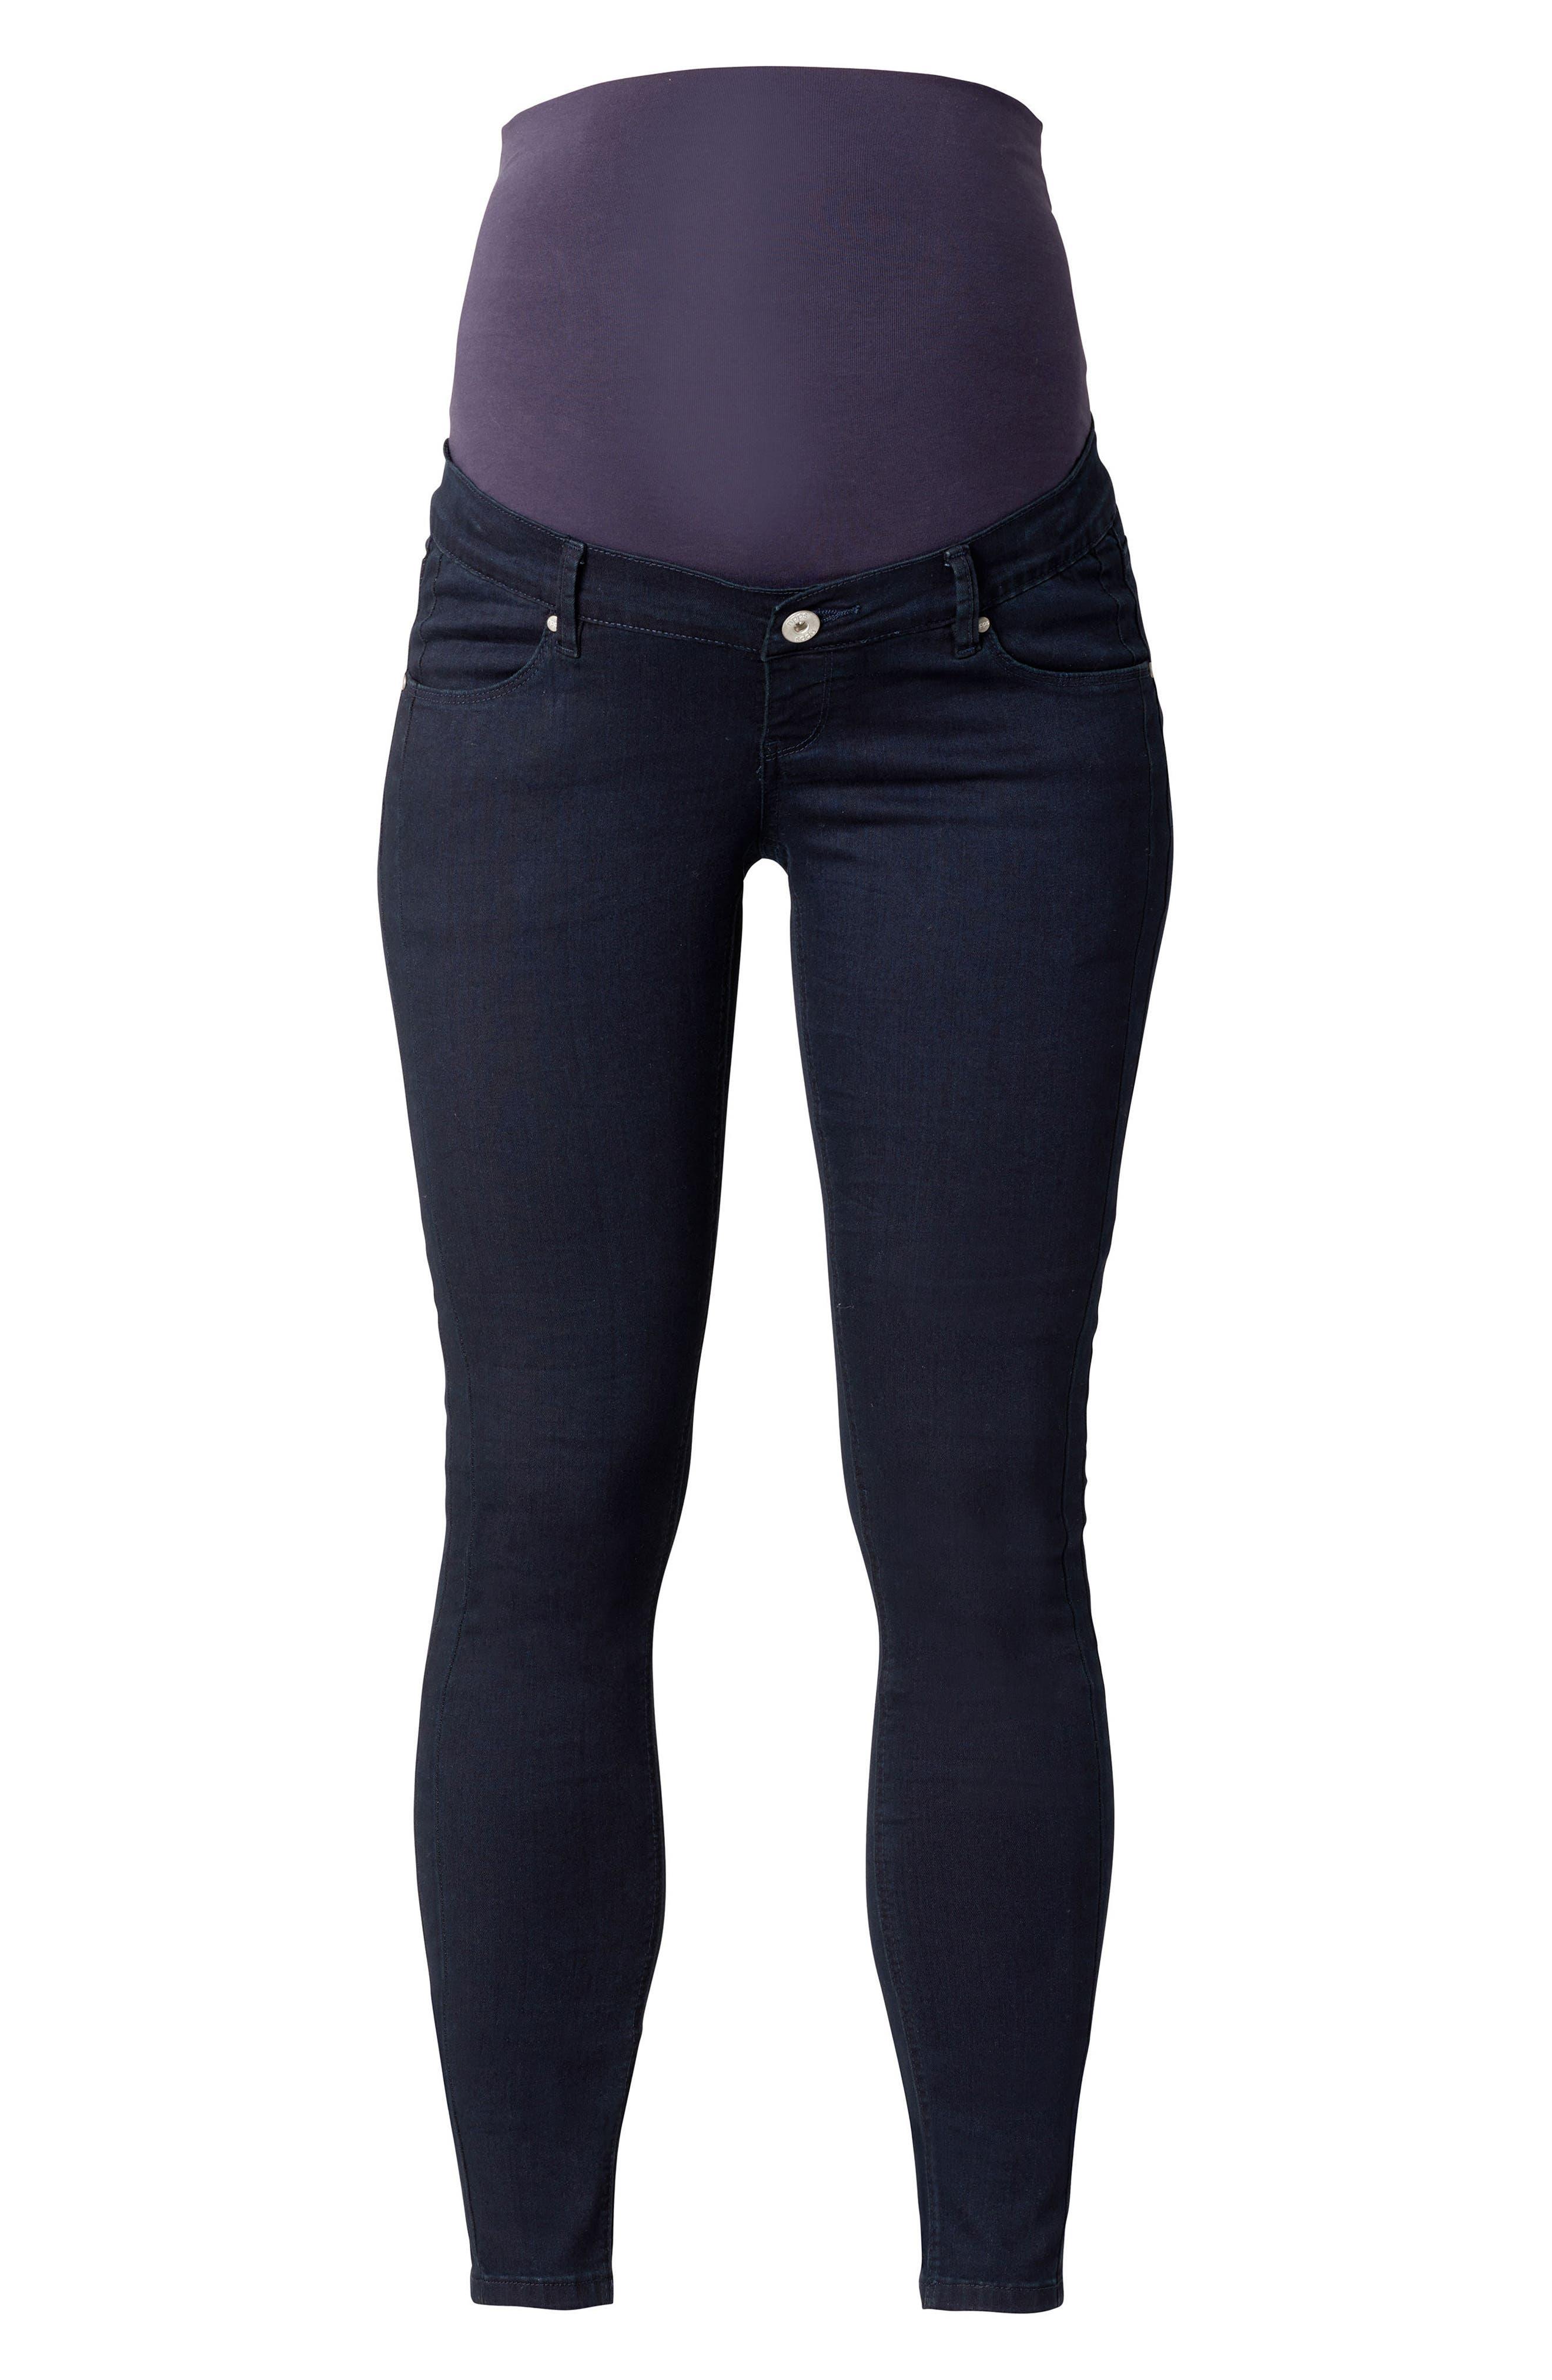 Avi Over the Belly Maternity Skinny Jeans,                         Main,                         color, Dark Blue